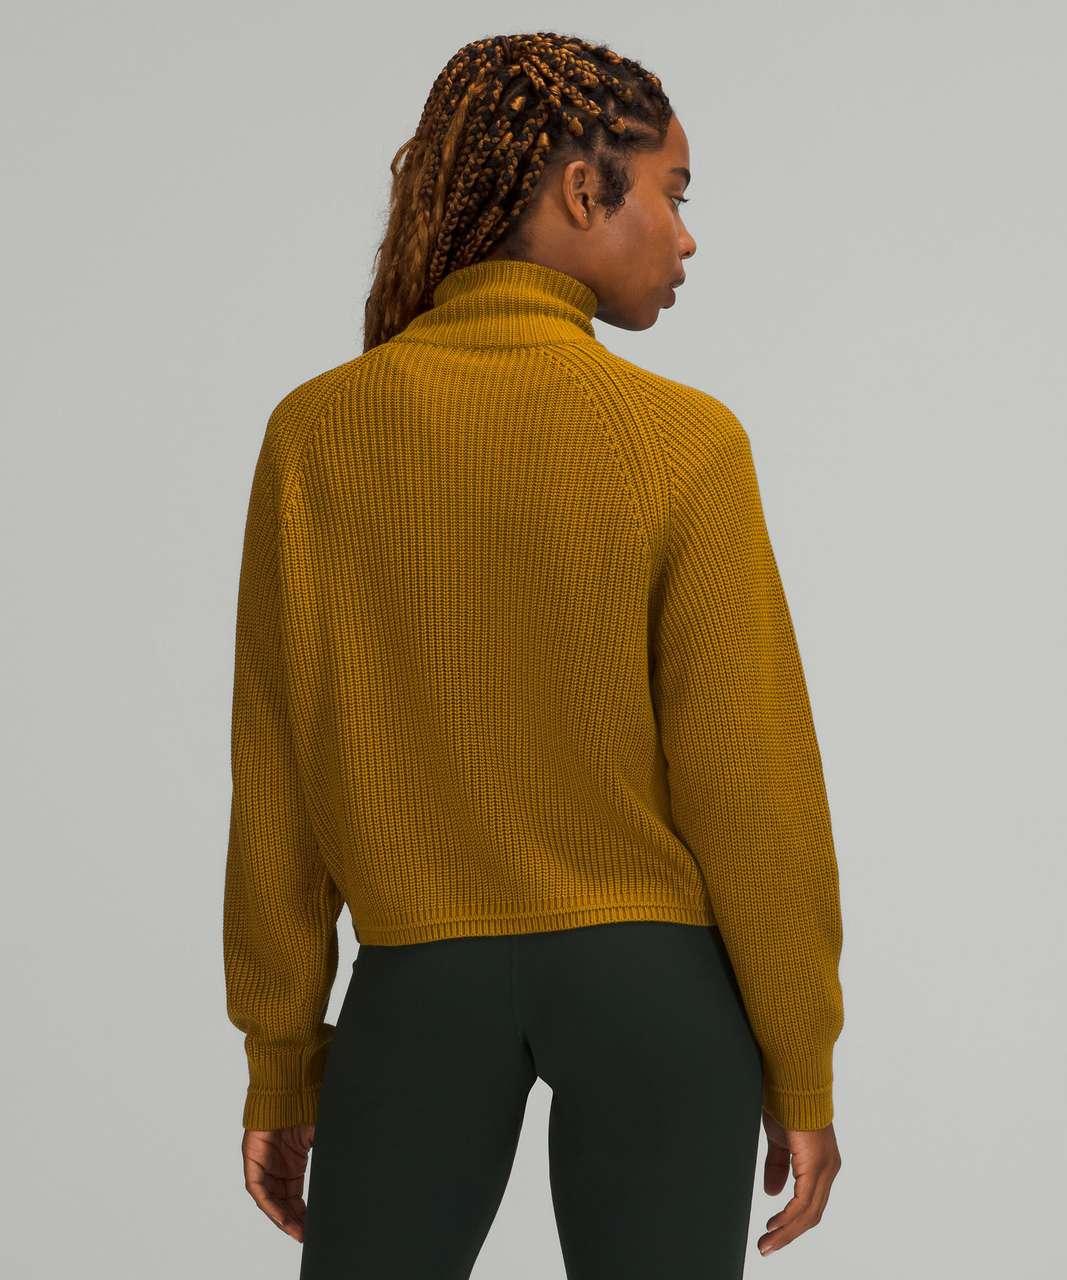 Lululemon Ribbed Turtleneck Sweater - Gold Spice